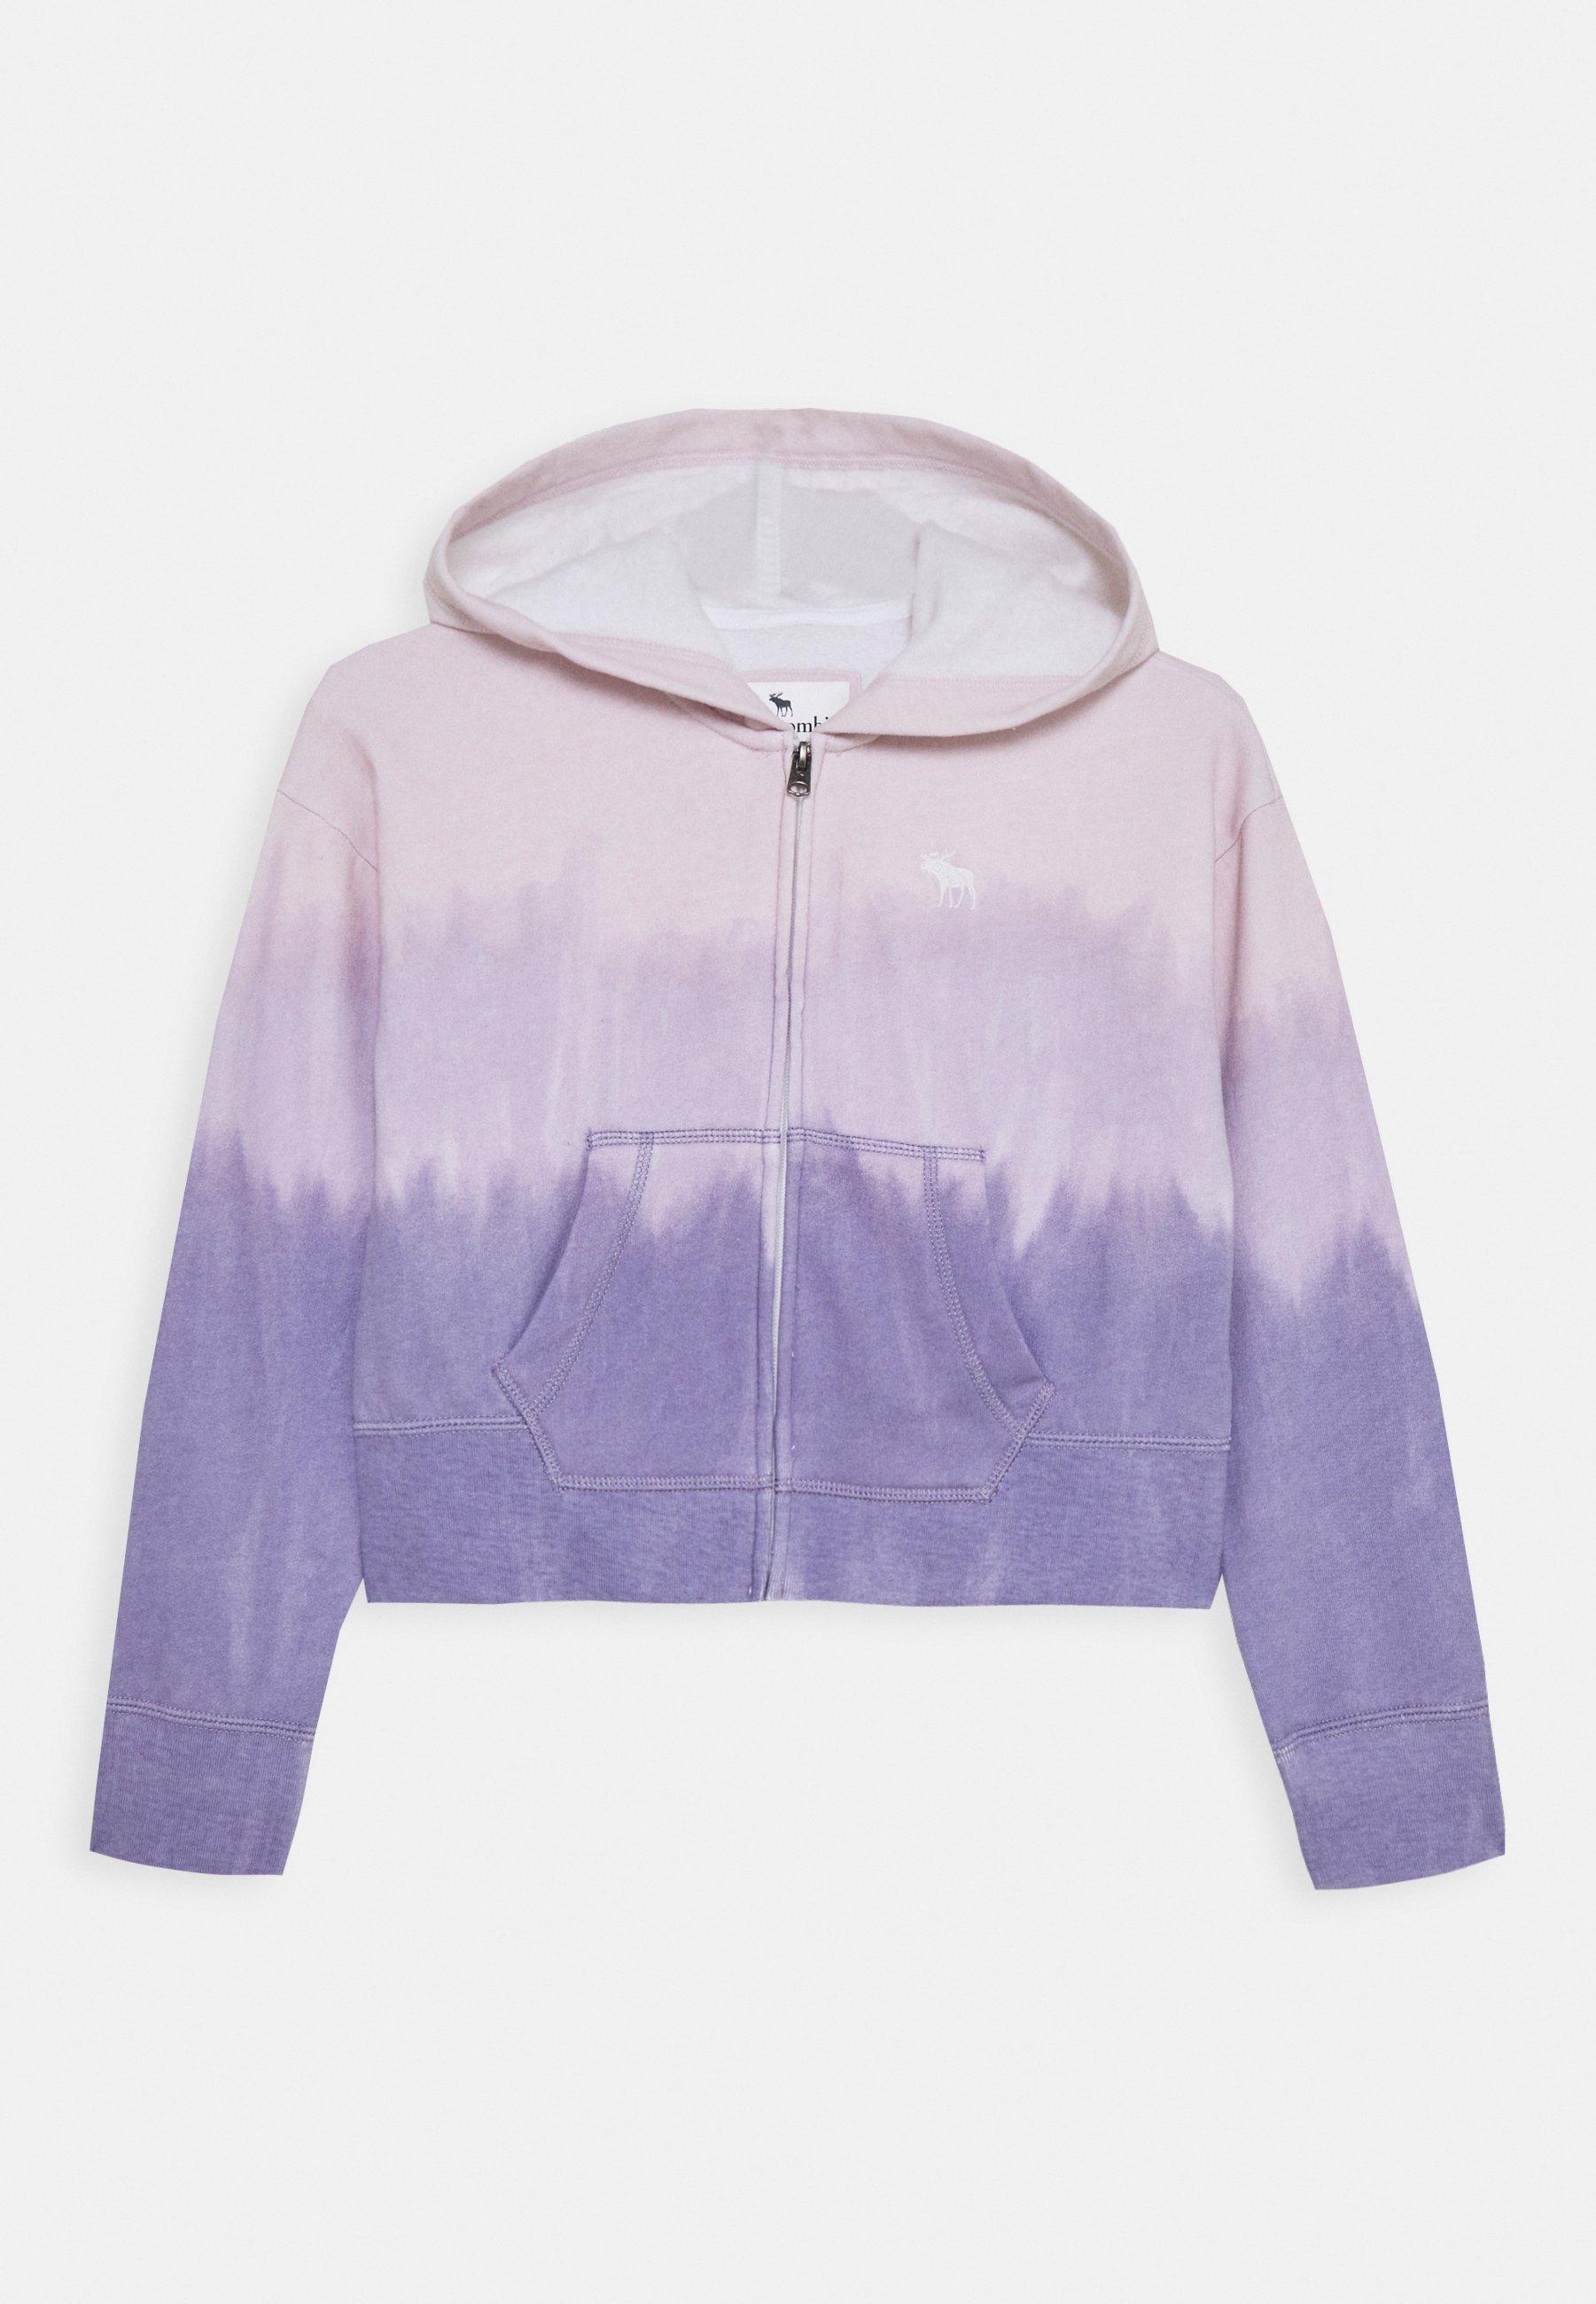 Große Förderung Abercrombie & Fitch CORE FULLZIP WASH - Sweatjacke - purple | Damenbekleidung 2020